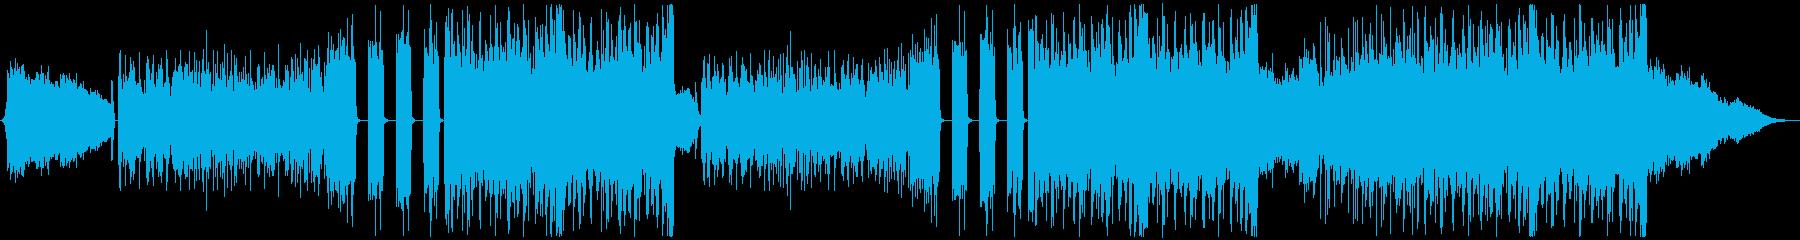 K-Pop、ダーク、ハード、ホラービートの再生済みの波形